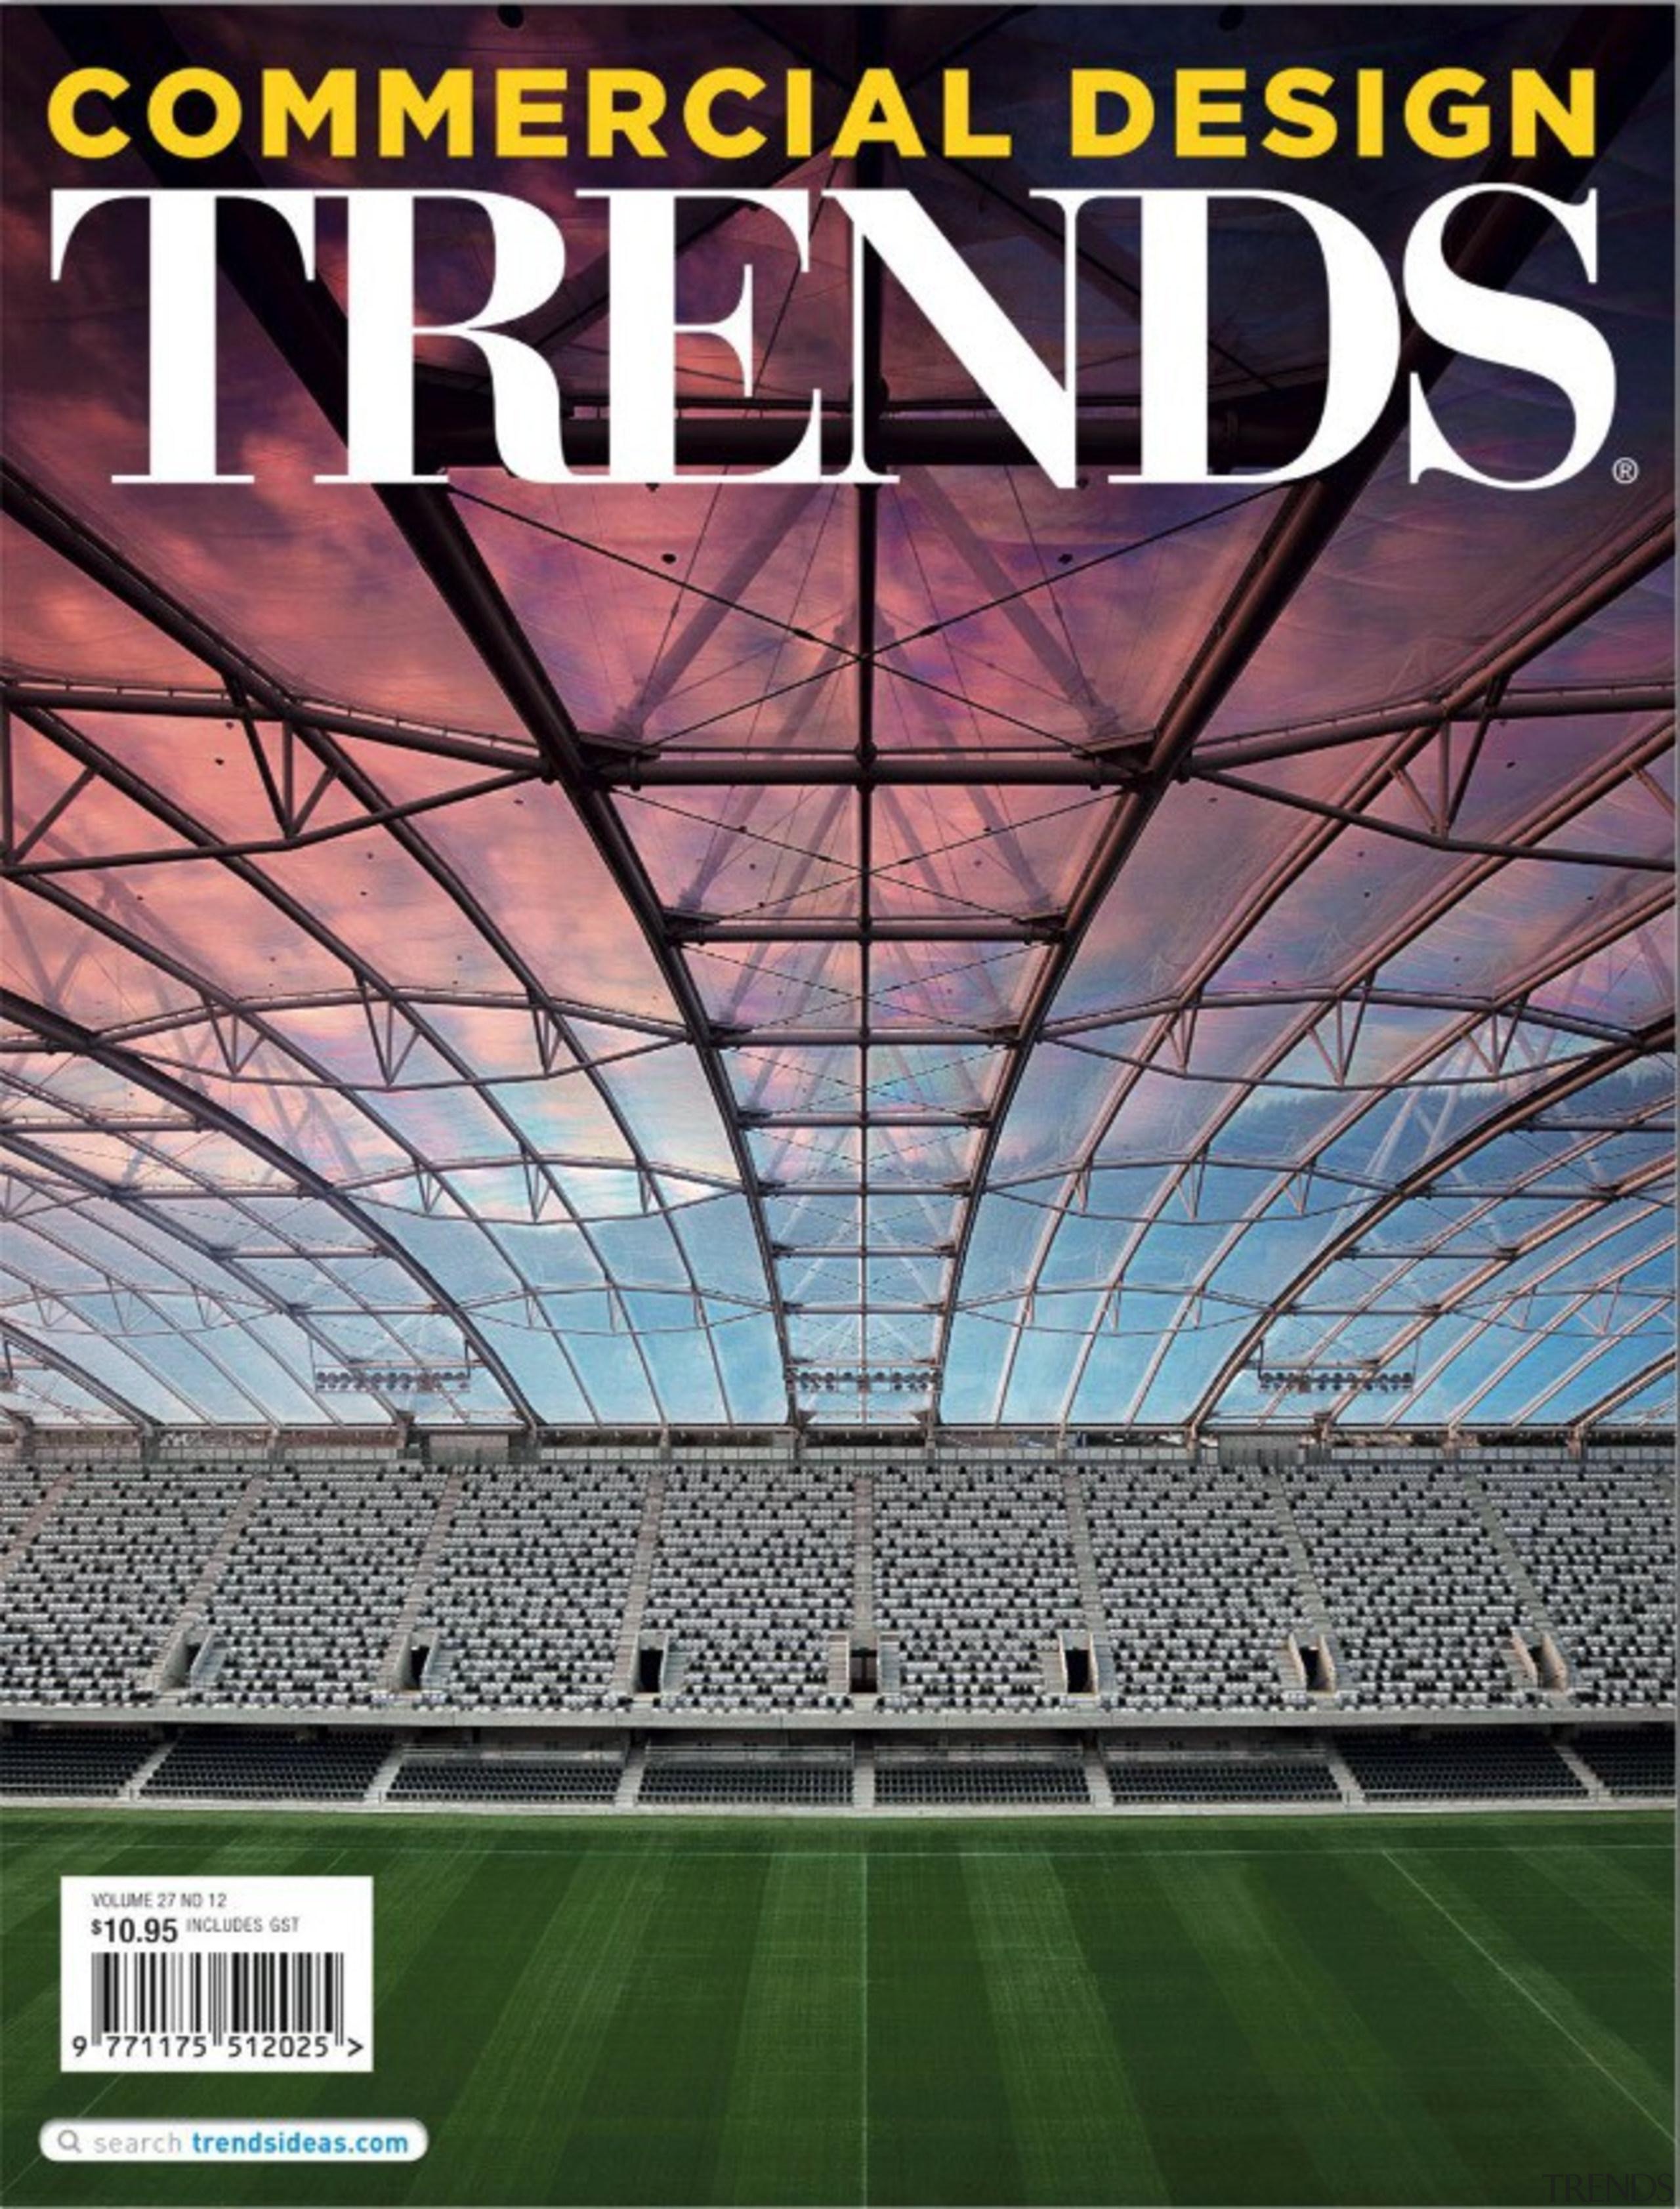 Book Cover Nz2712 architecture, arena, atmosphere, net, player, soccer specific stadium, sport venue, stadium, structure